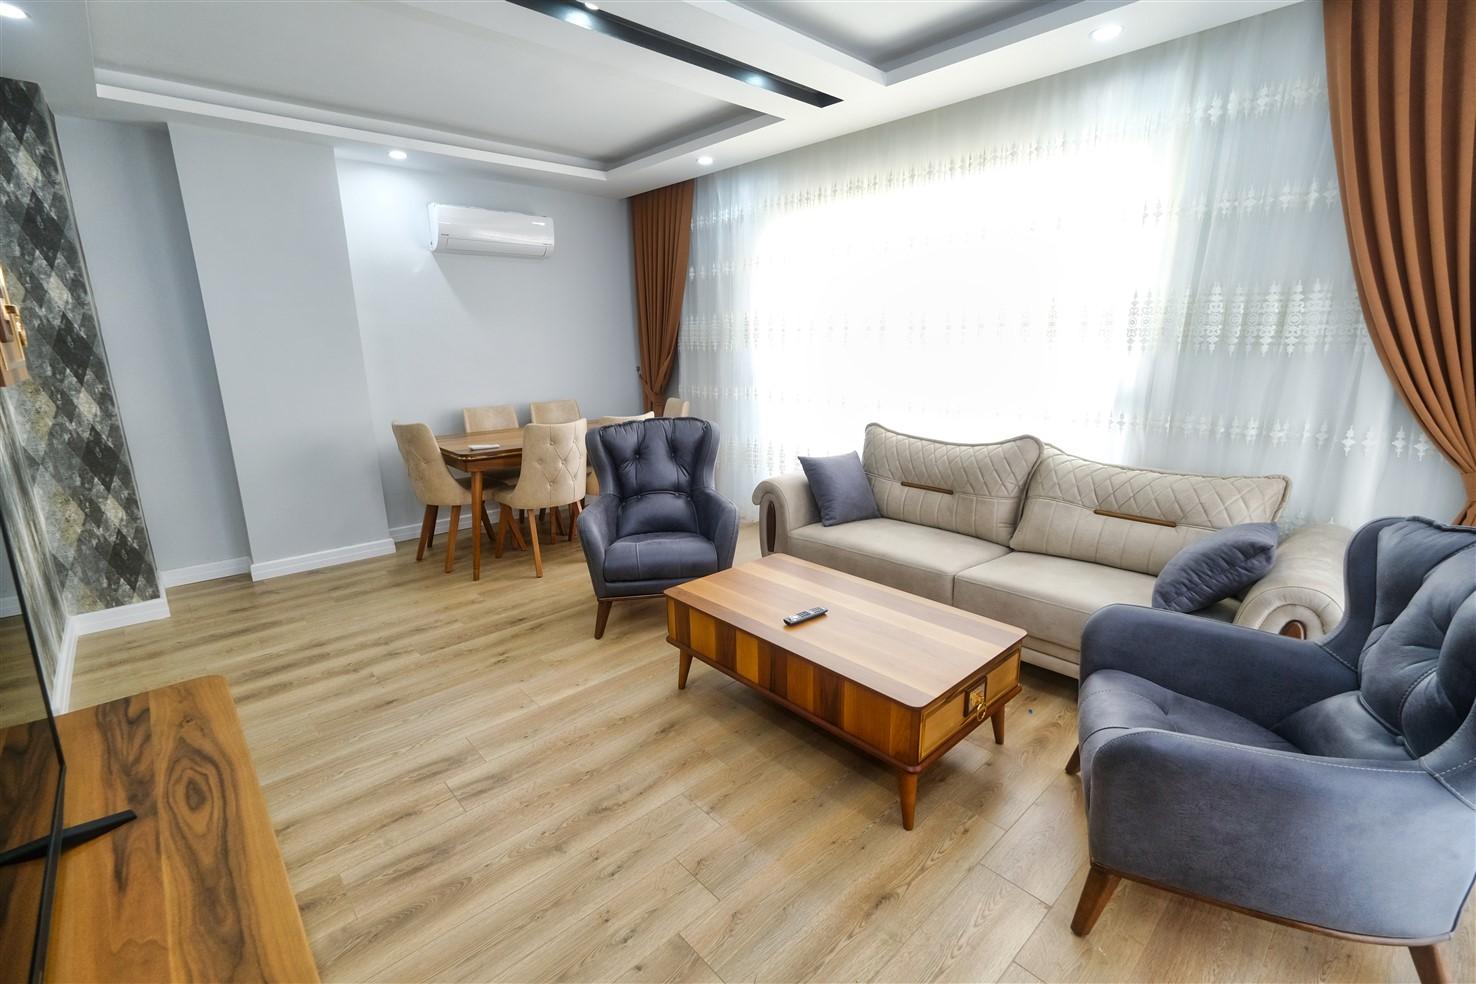 Трёхкомнатная квартира в центре Антальи - Фото 21